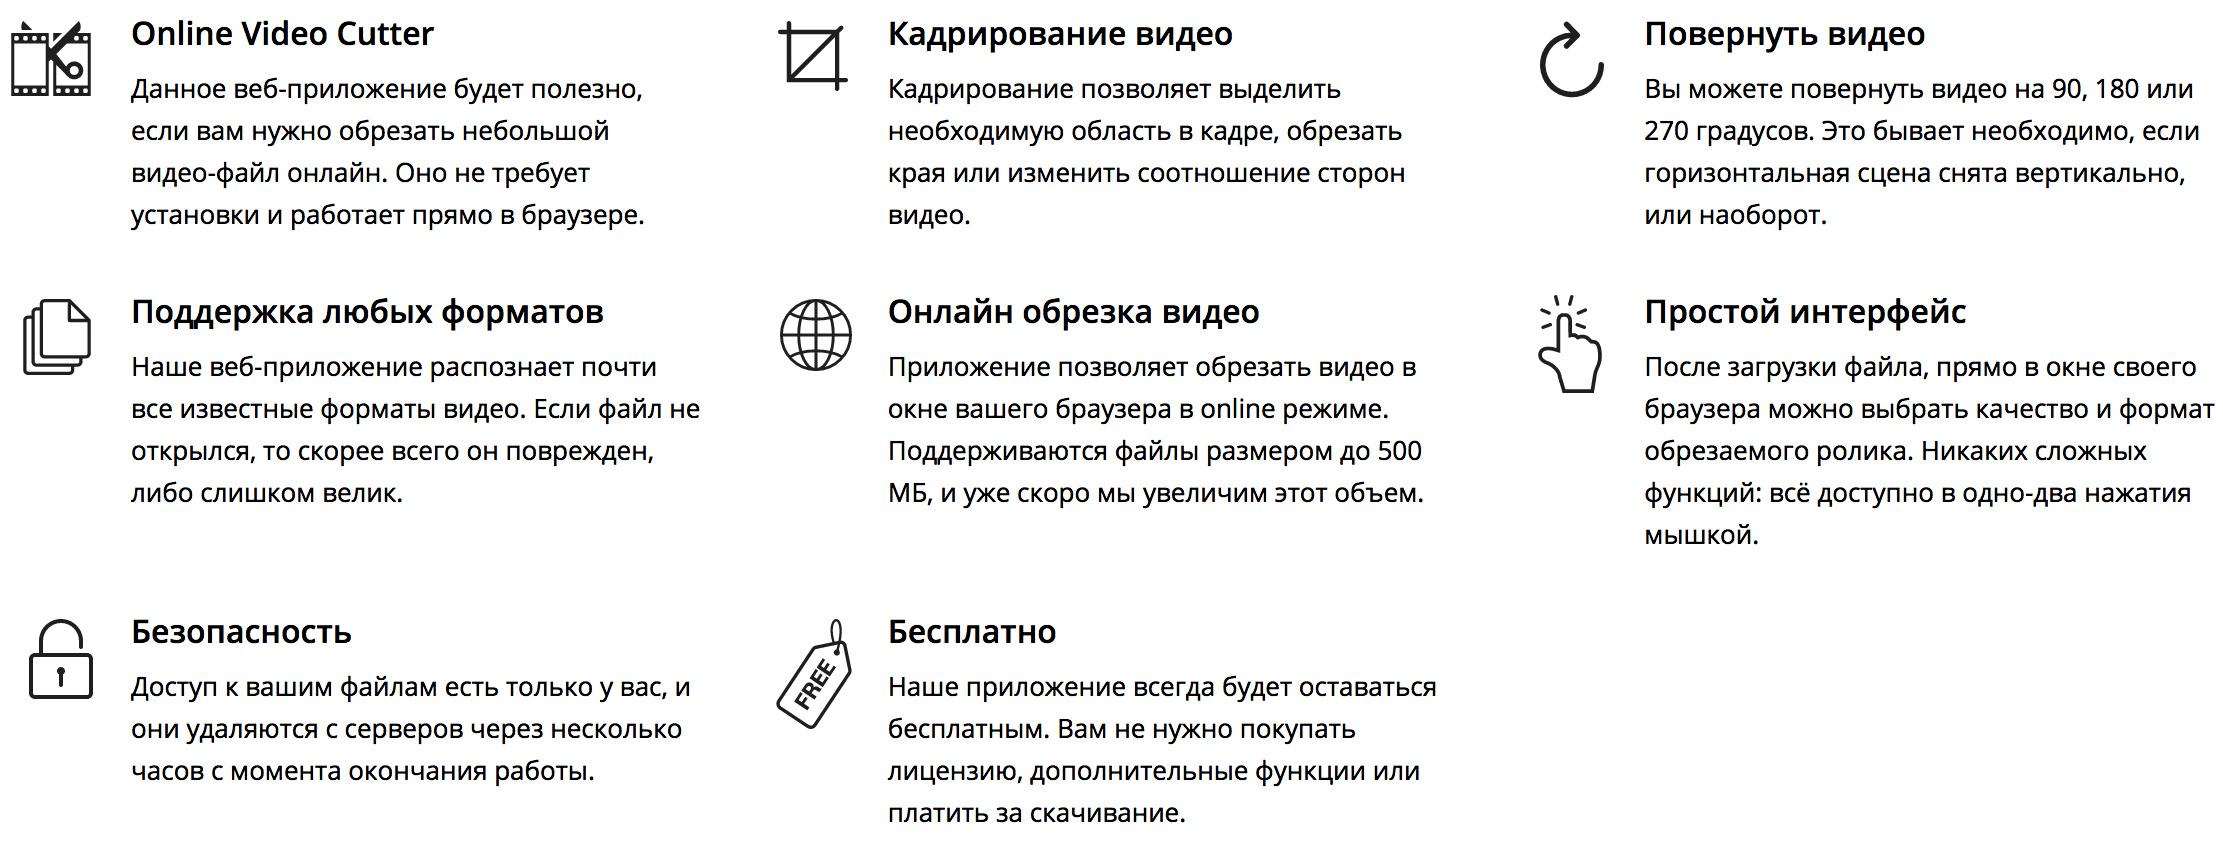 snimok-ekrana-2016-11-07-v-23-46-32-png